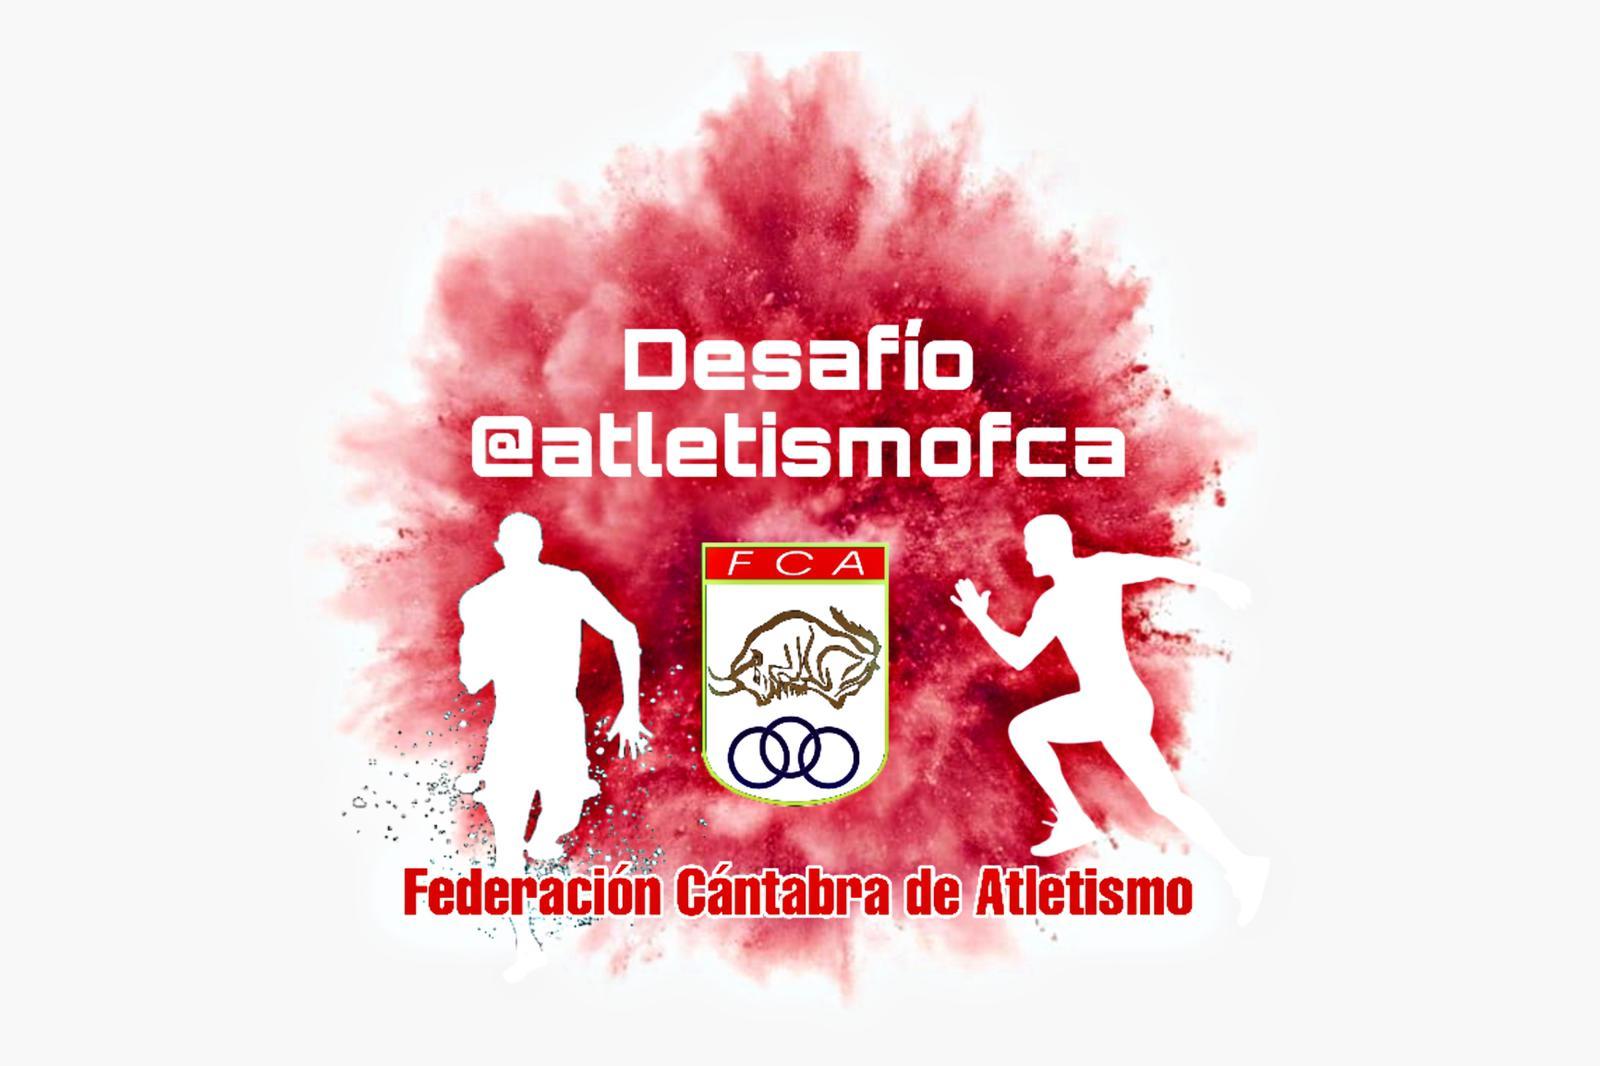 logo_desafio@atletismofca